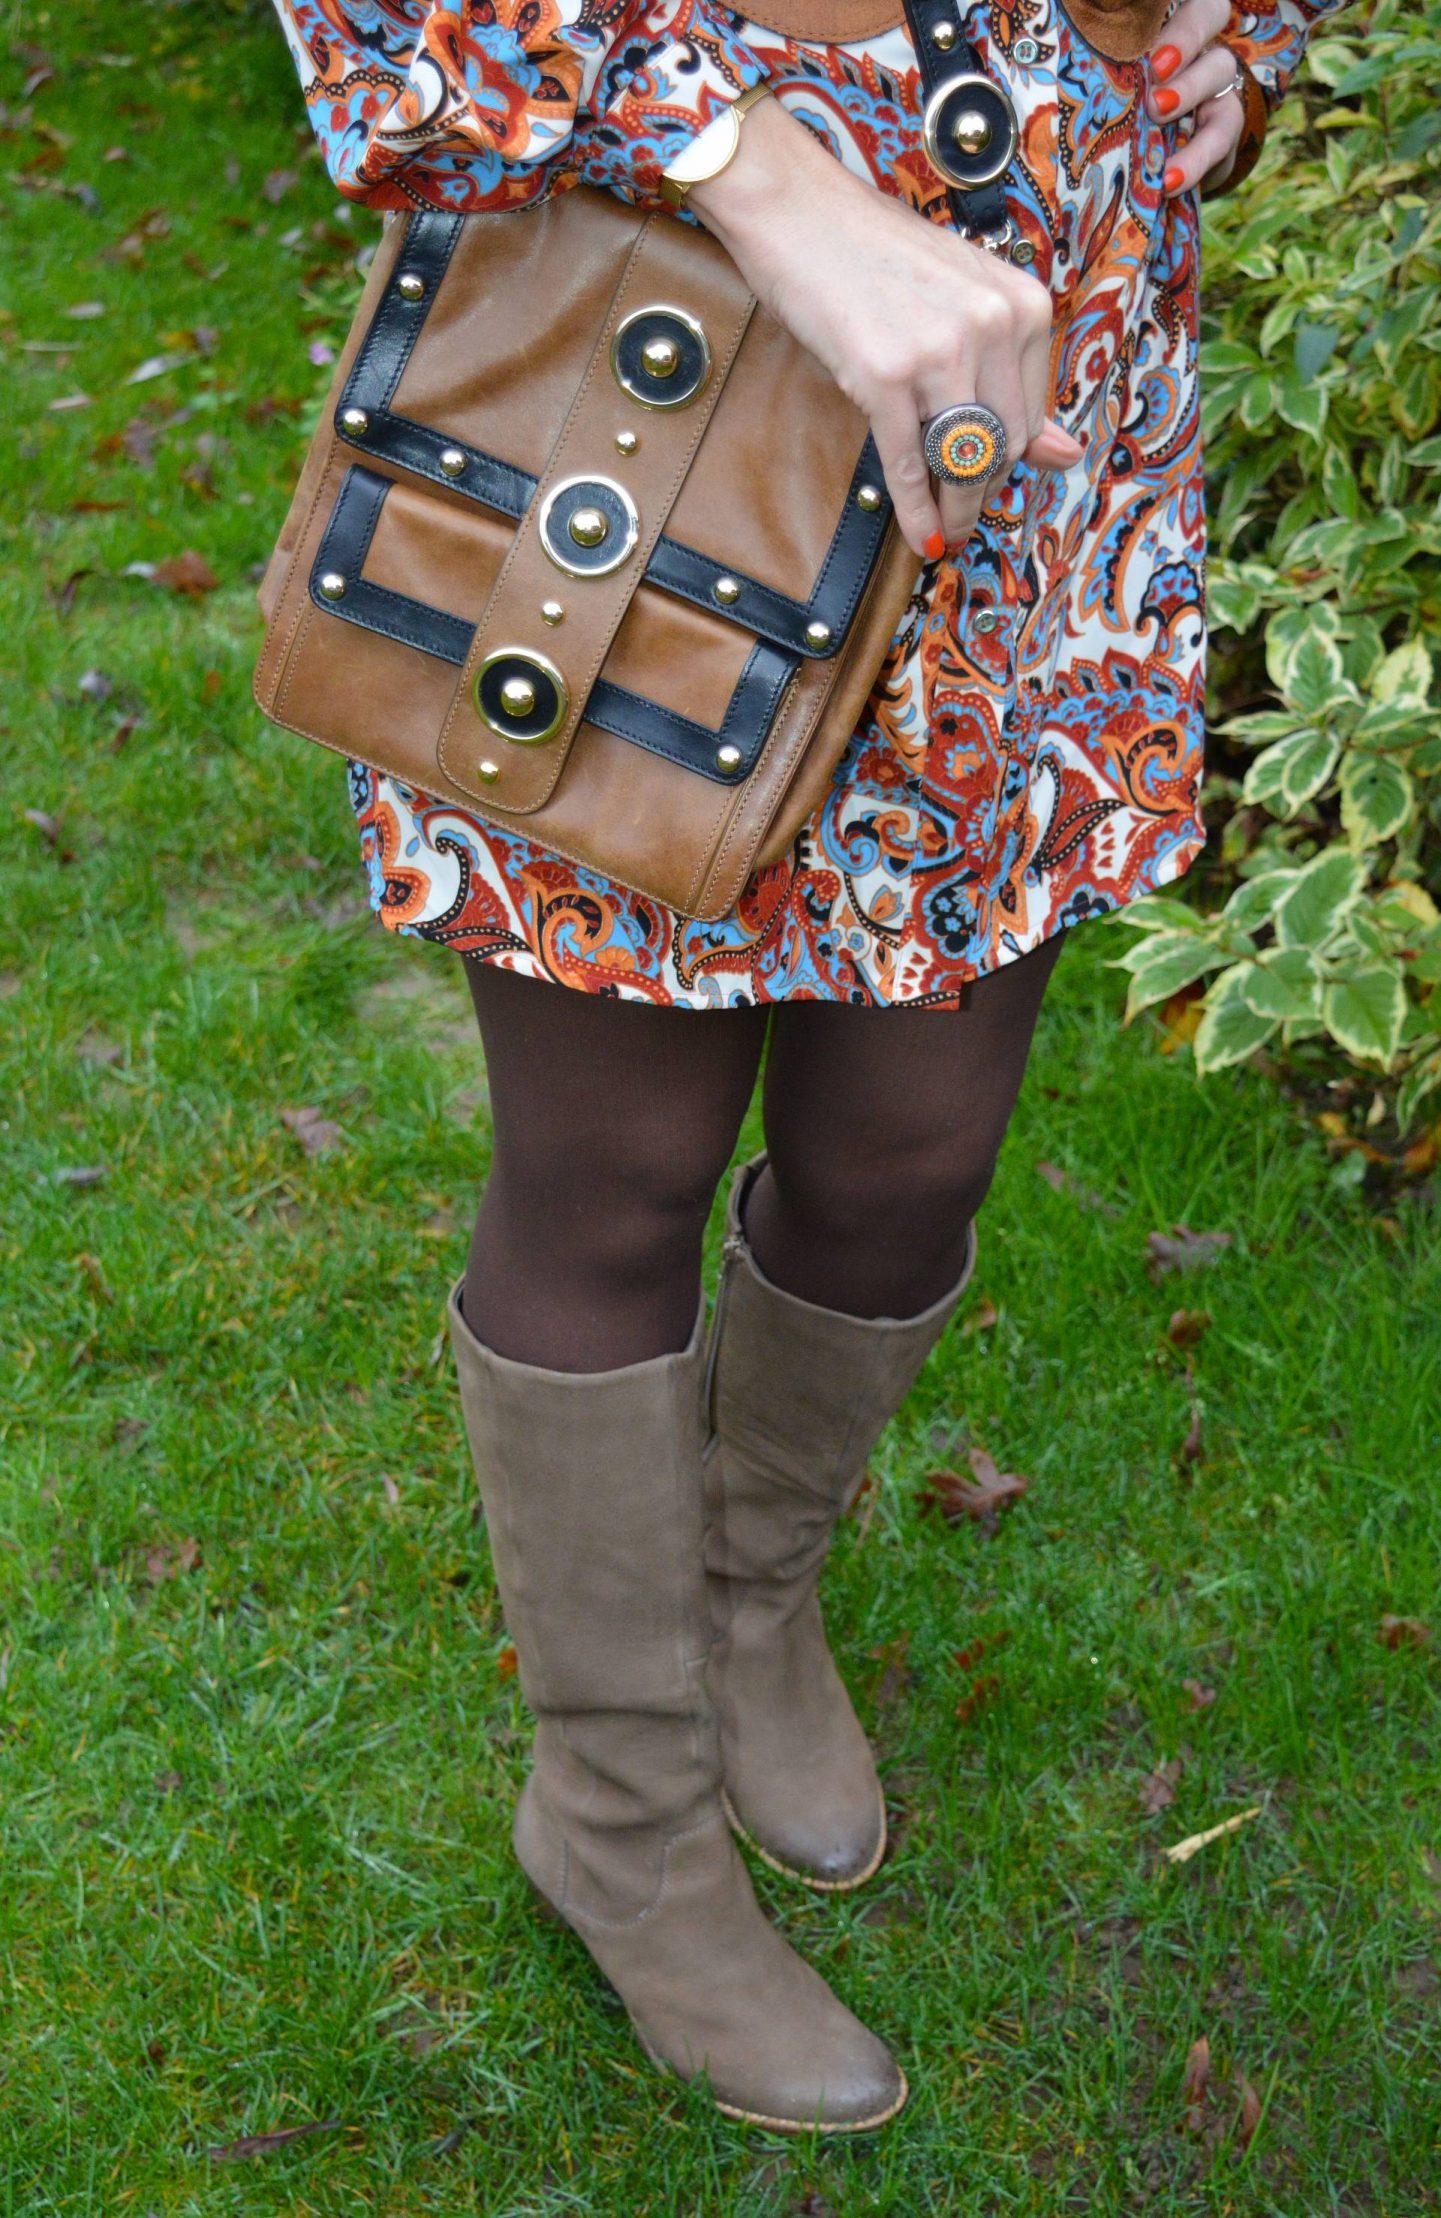 Temperley London Trinity messenger bag, Cara brown knee boots